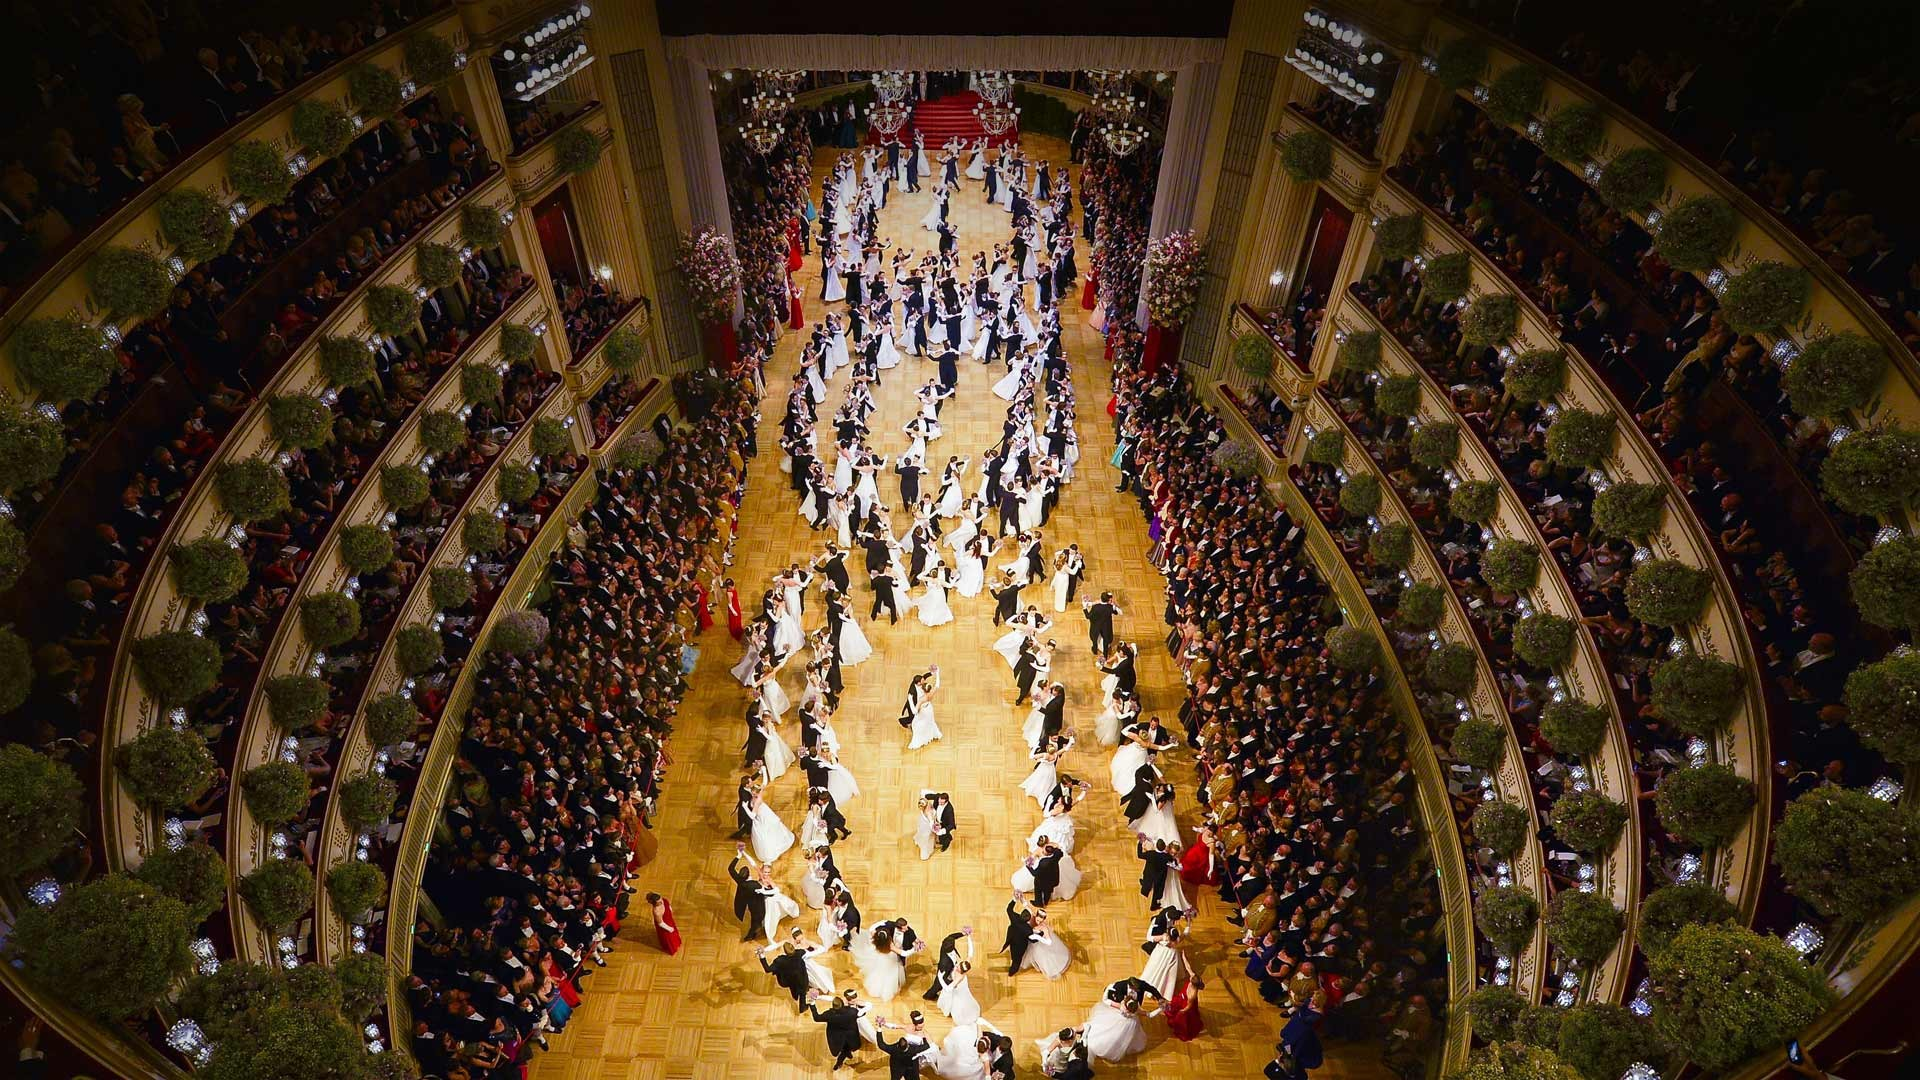 General 1920x1080 Bing 2017 (Year) photography Vienna opera